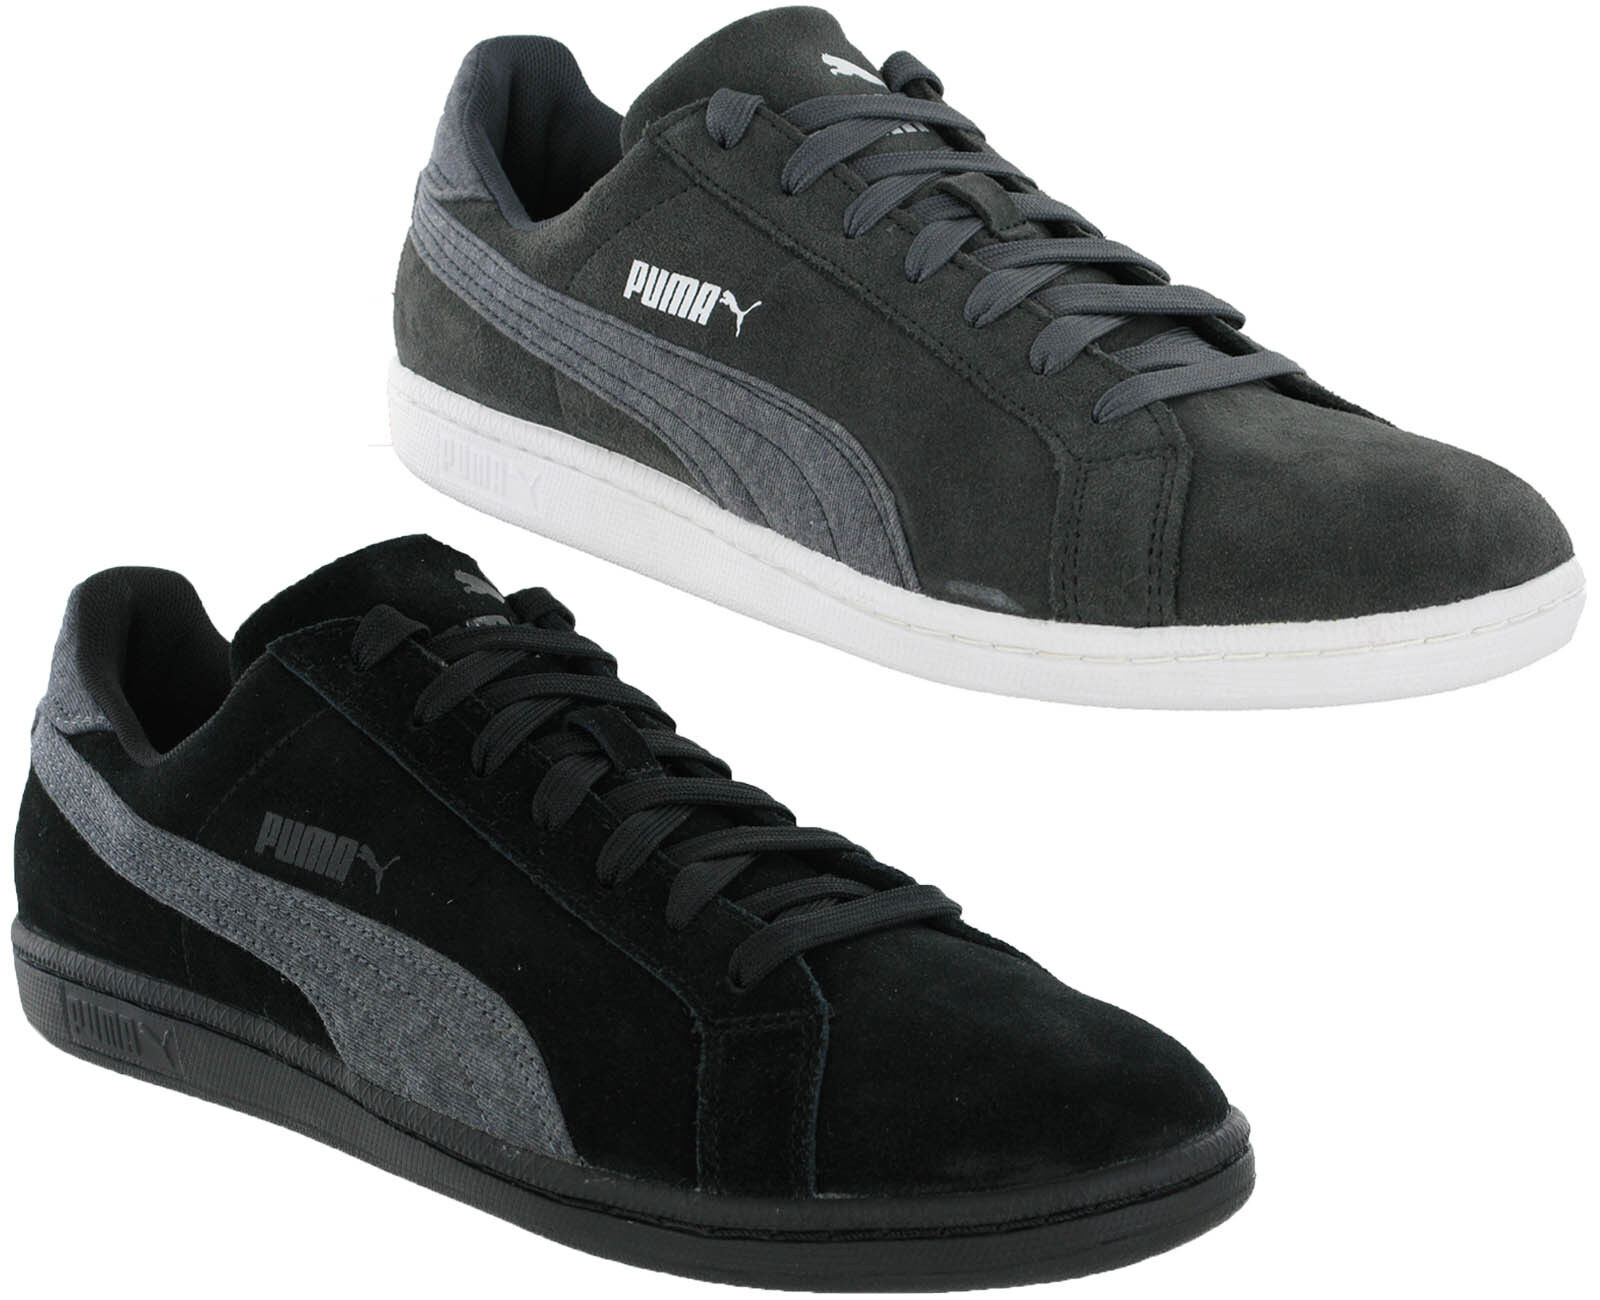 Puma Suede Classic Smash Jersey Leather